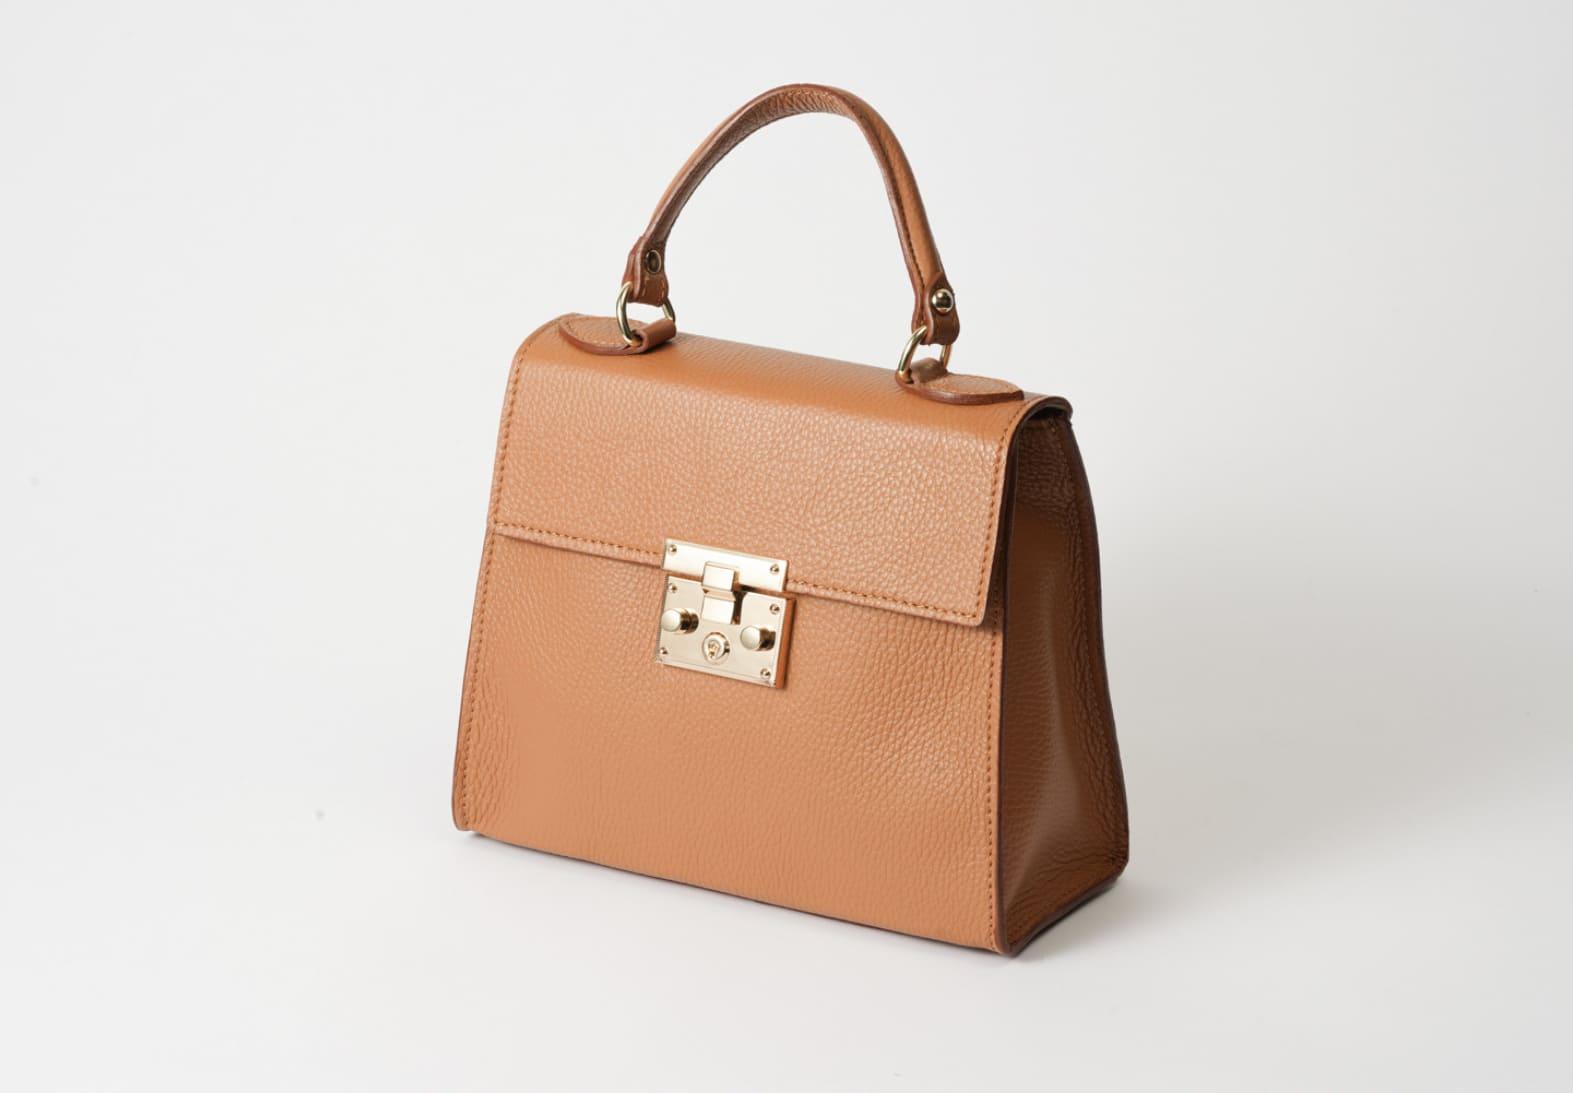 AULENTTI オーレンティのバッグを販売するセムインターナショナル。通販でも購入可能